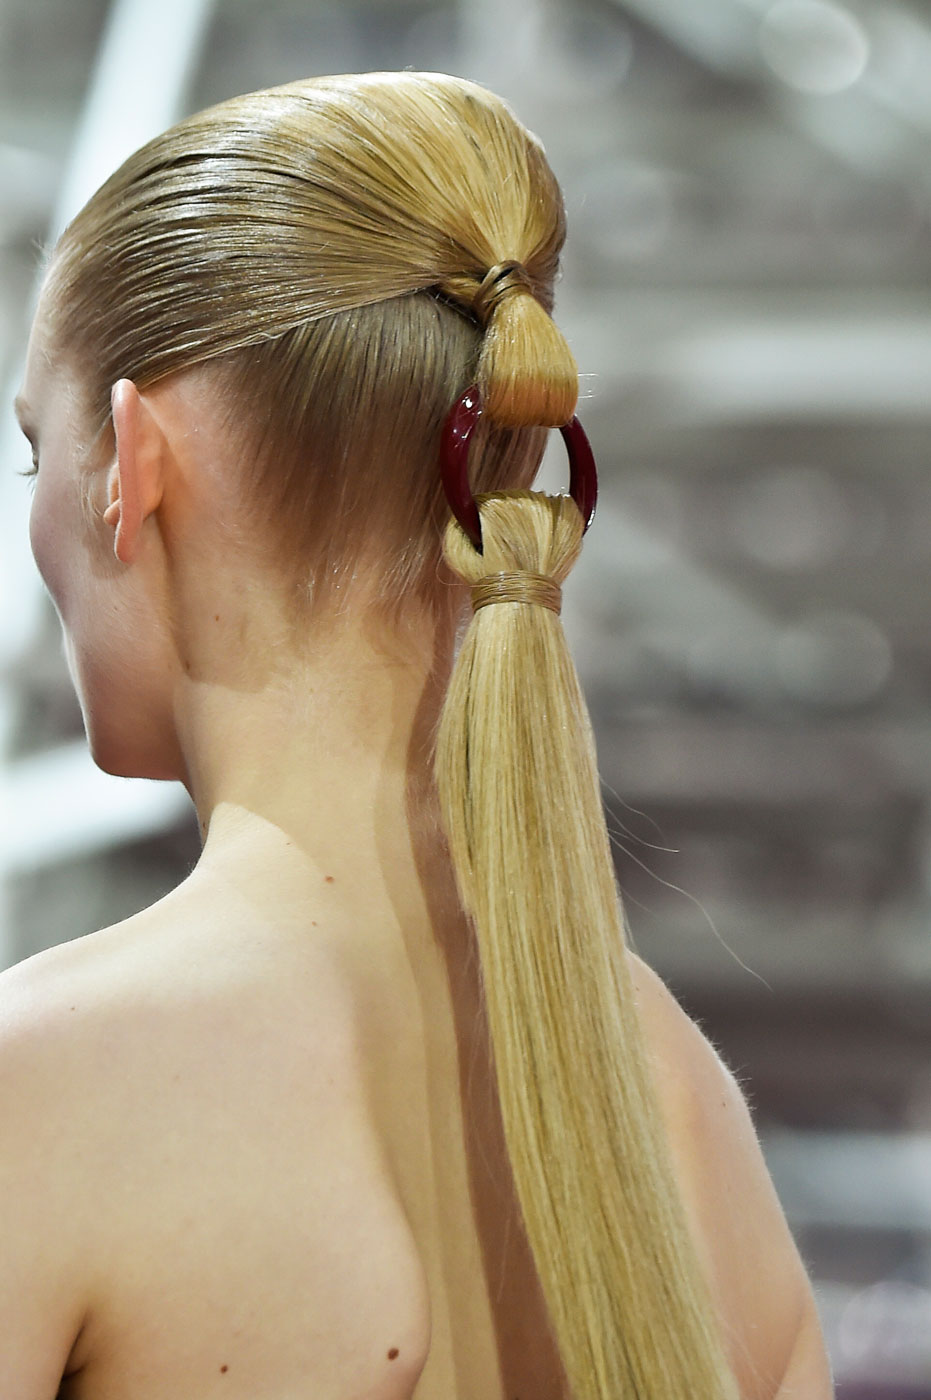 Christian-Dior-fashion-runway-show-close-ups-haute-couture-paris-spring-summer-2015-the-impression-103